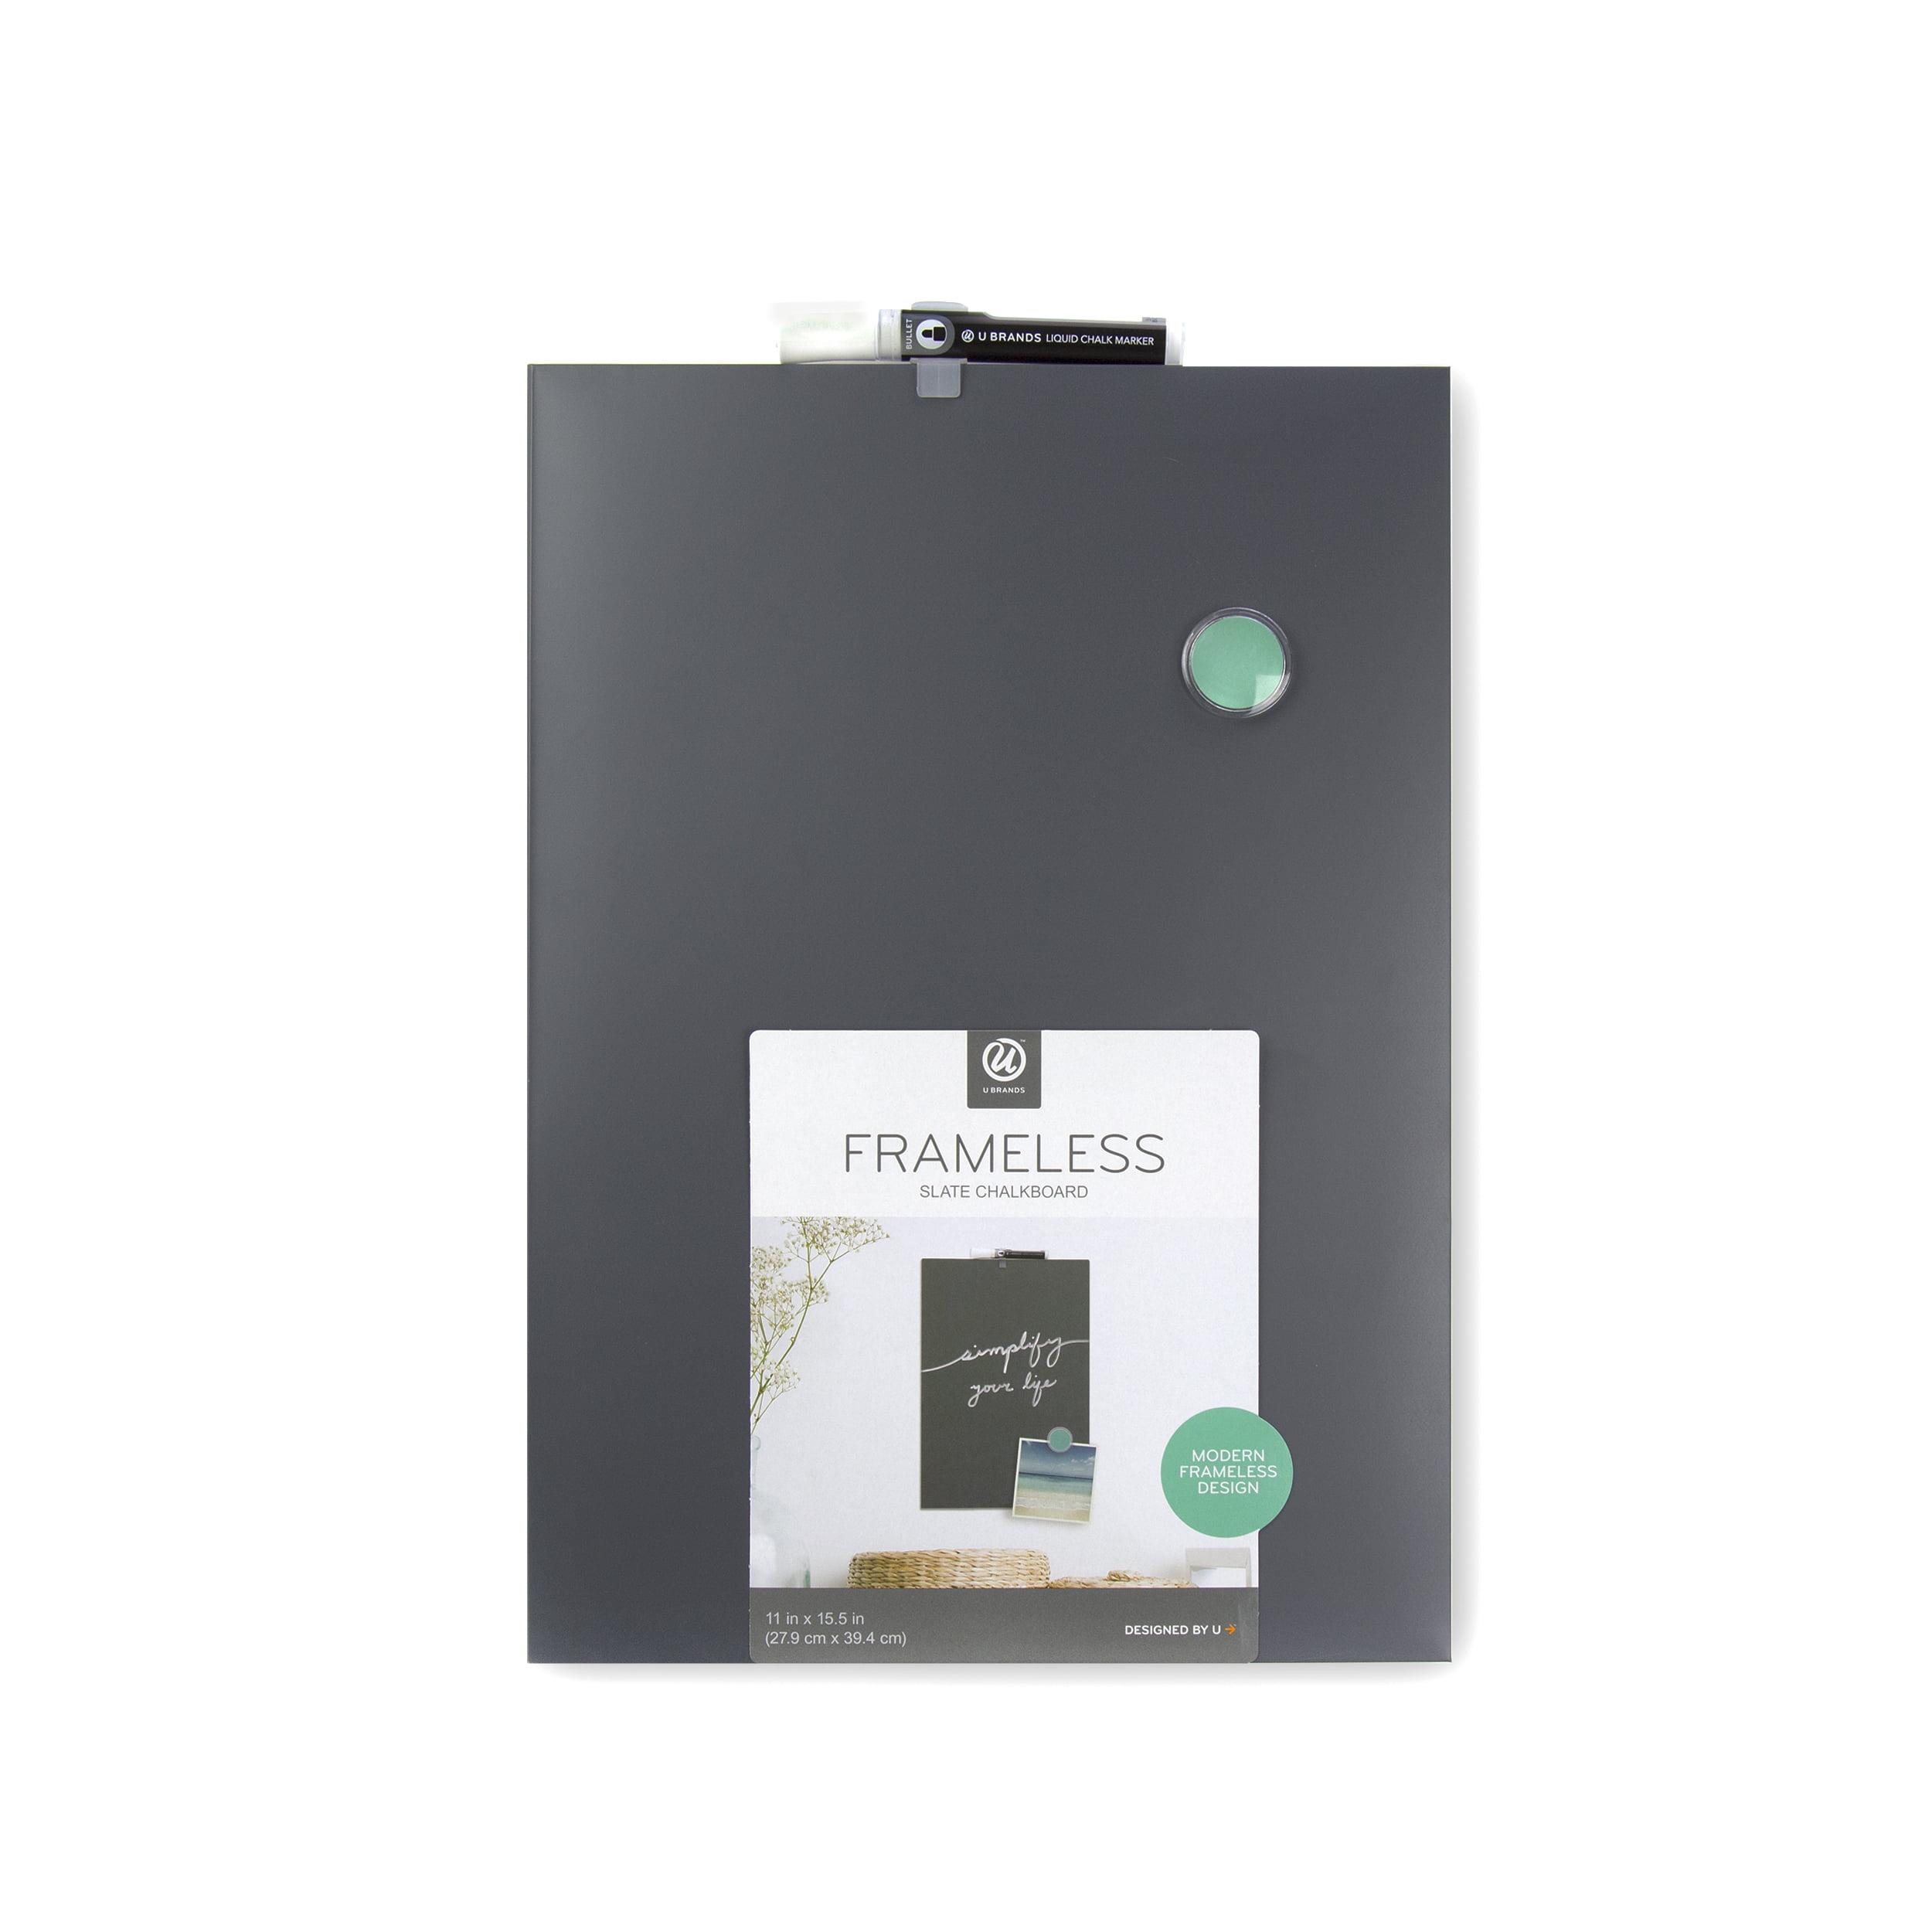 U Brands Magnetic Chalkboard, 11 X 15.5 Inches, Frameless by U Brands, LLC